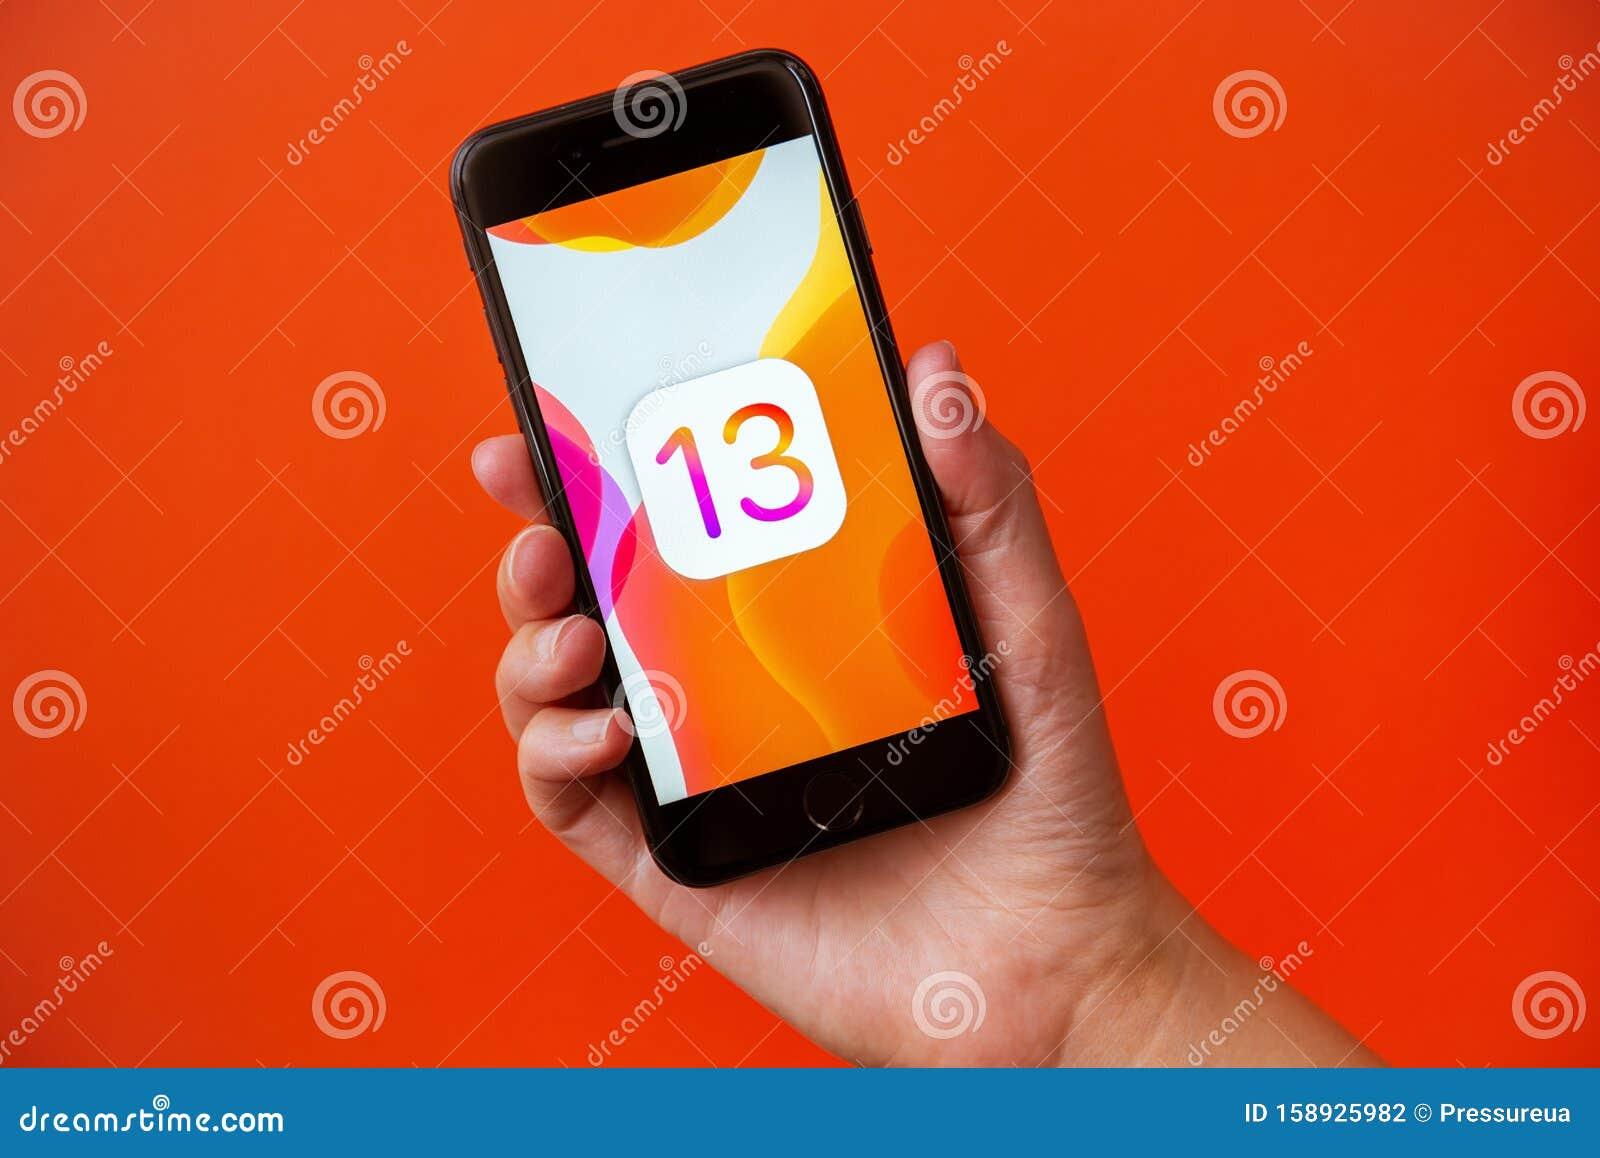 apple iphone ios image screen kyiv ukraine september studio shot hand holding abstract wallpaper release 158925982